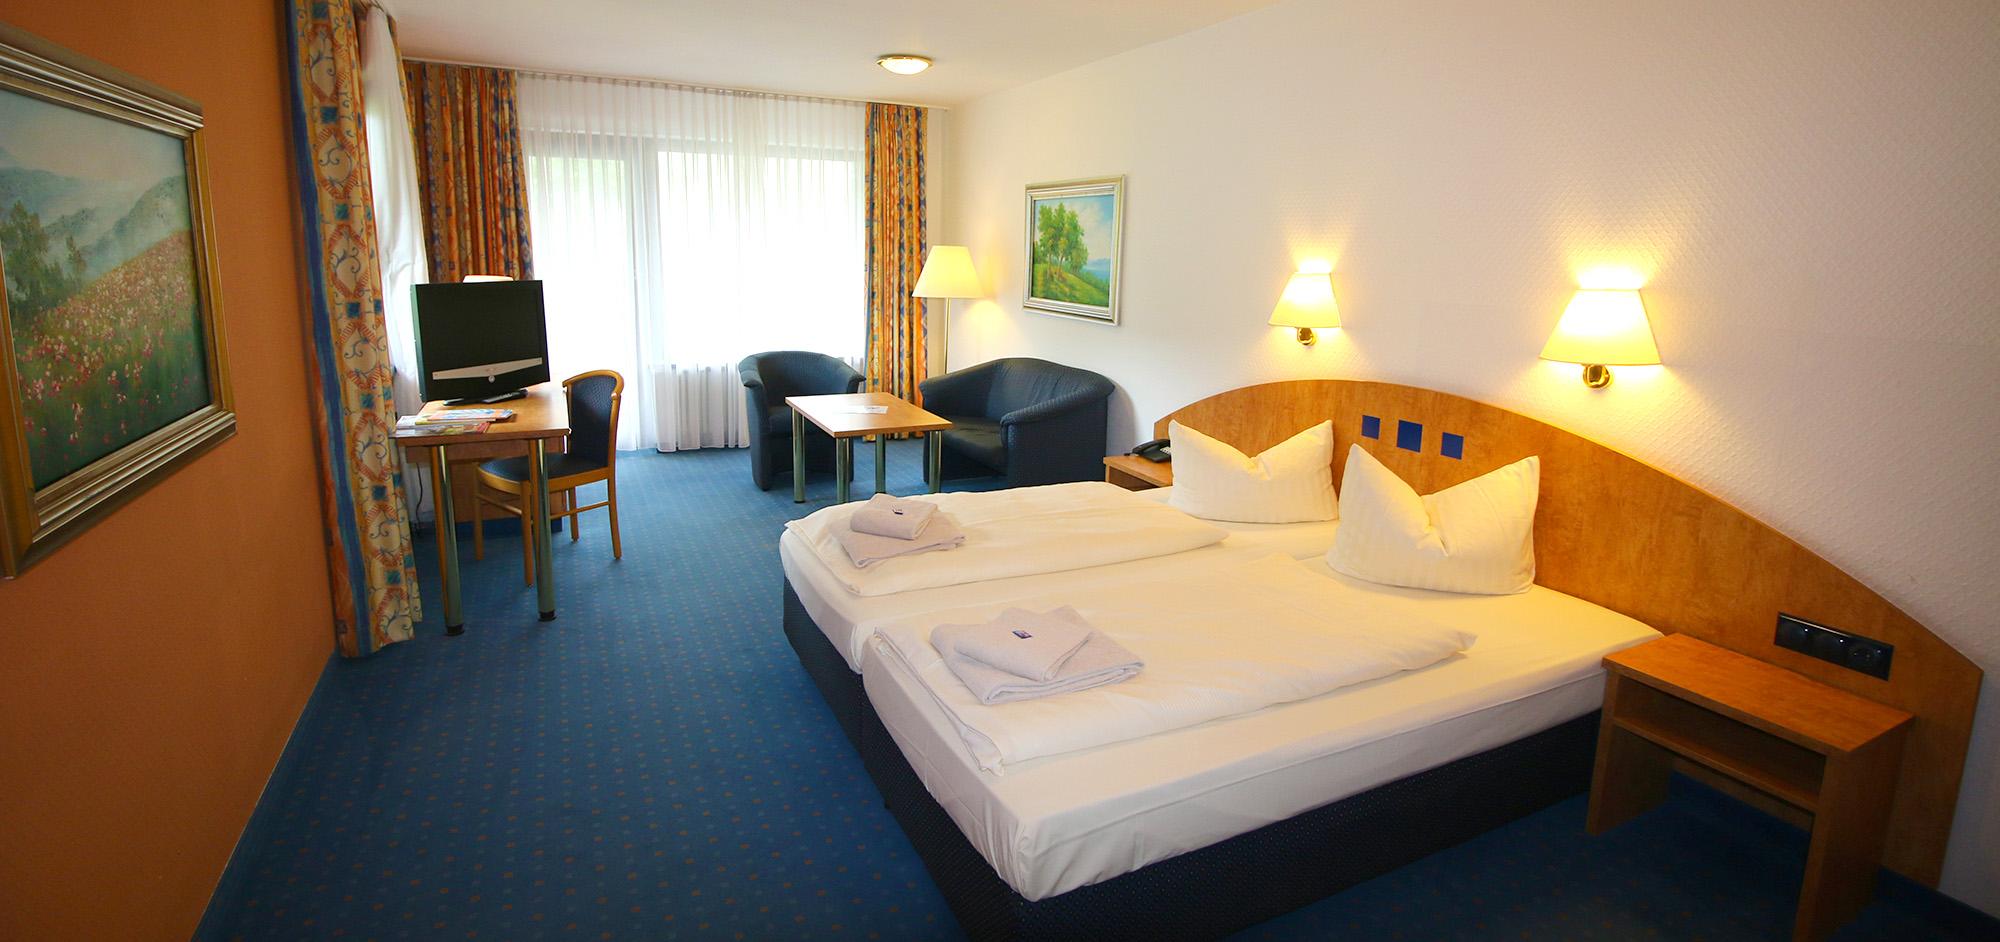 Hotel Lochmuehle Rooms